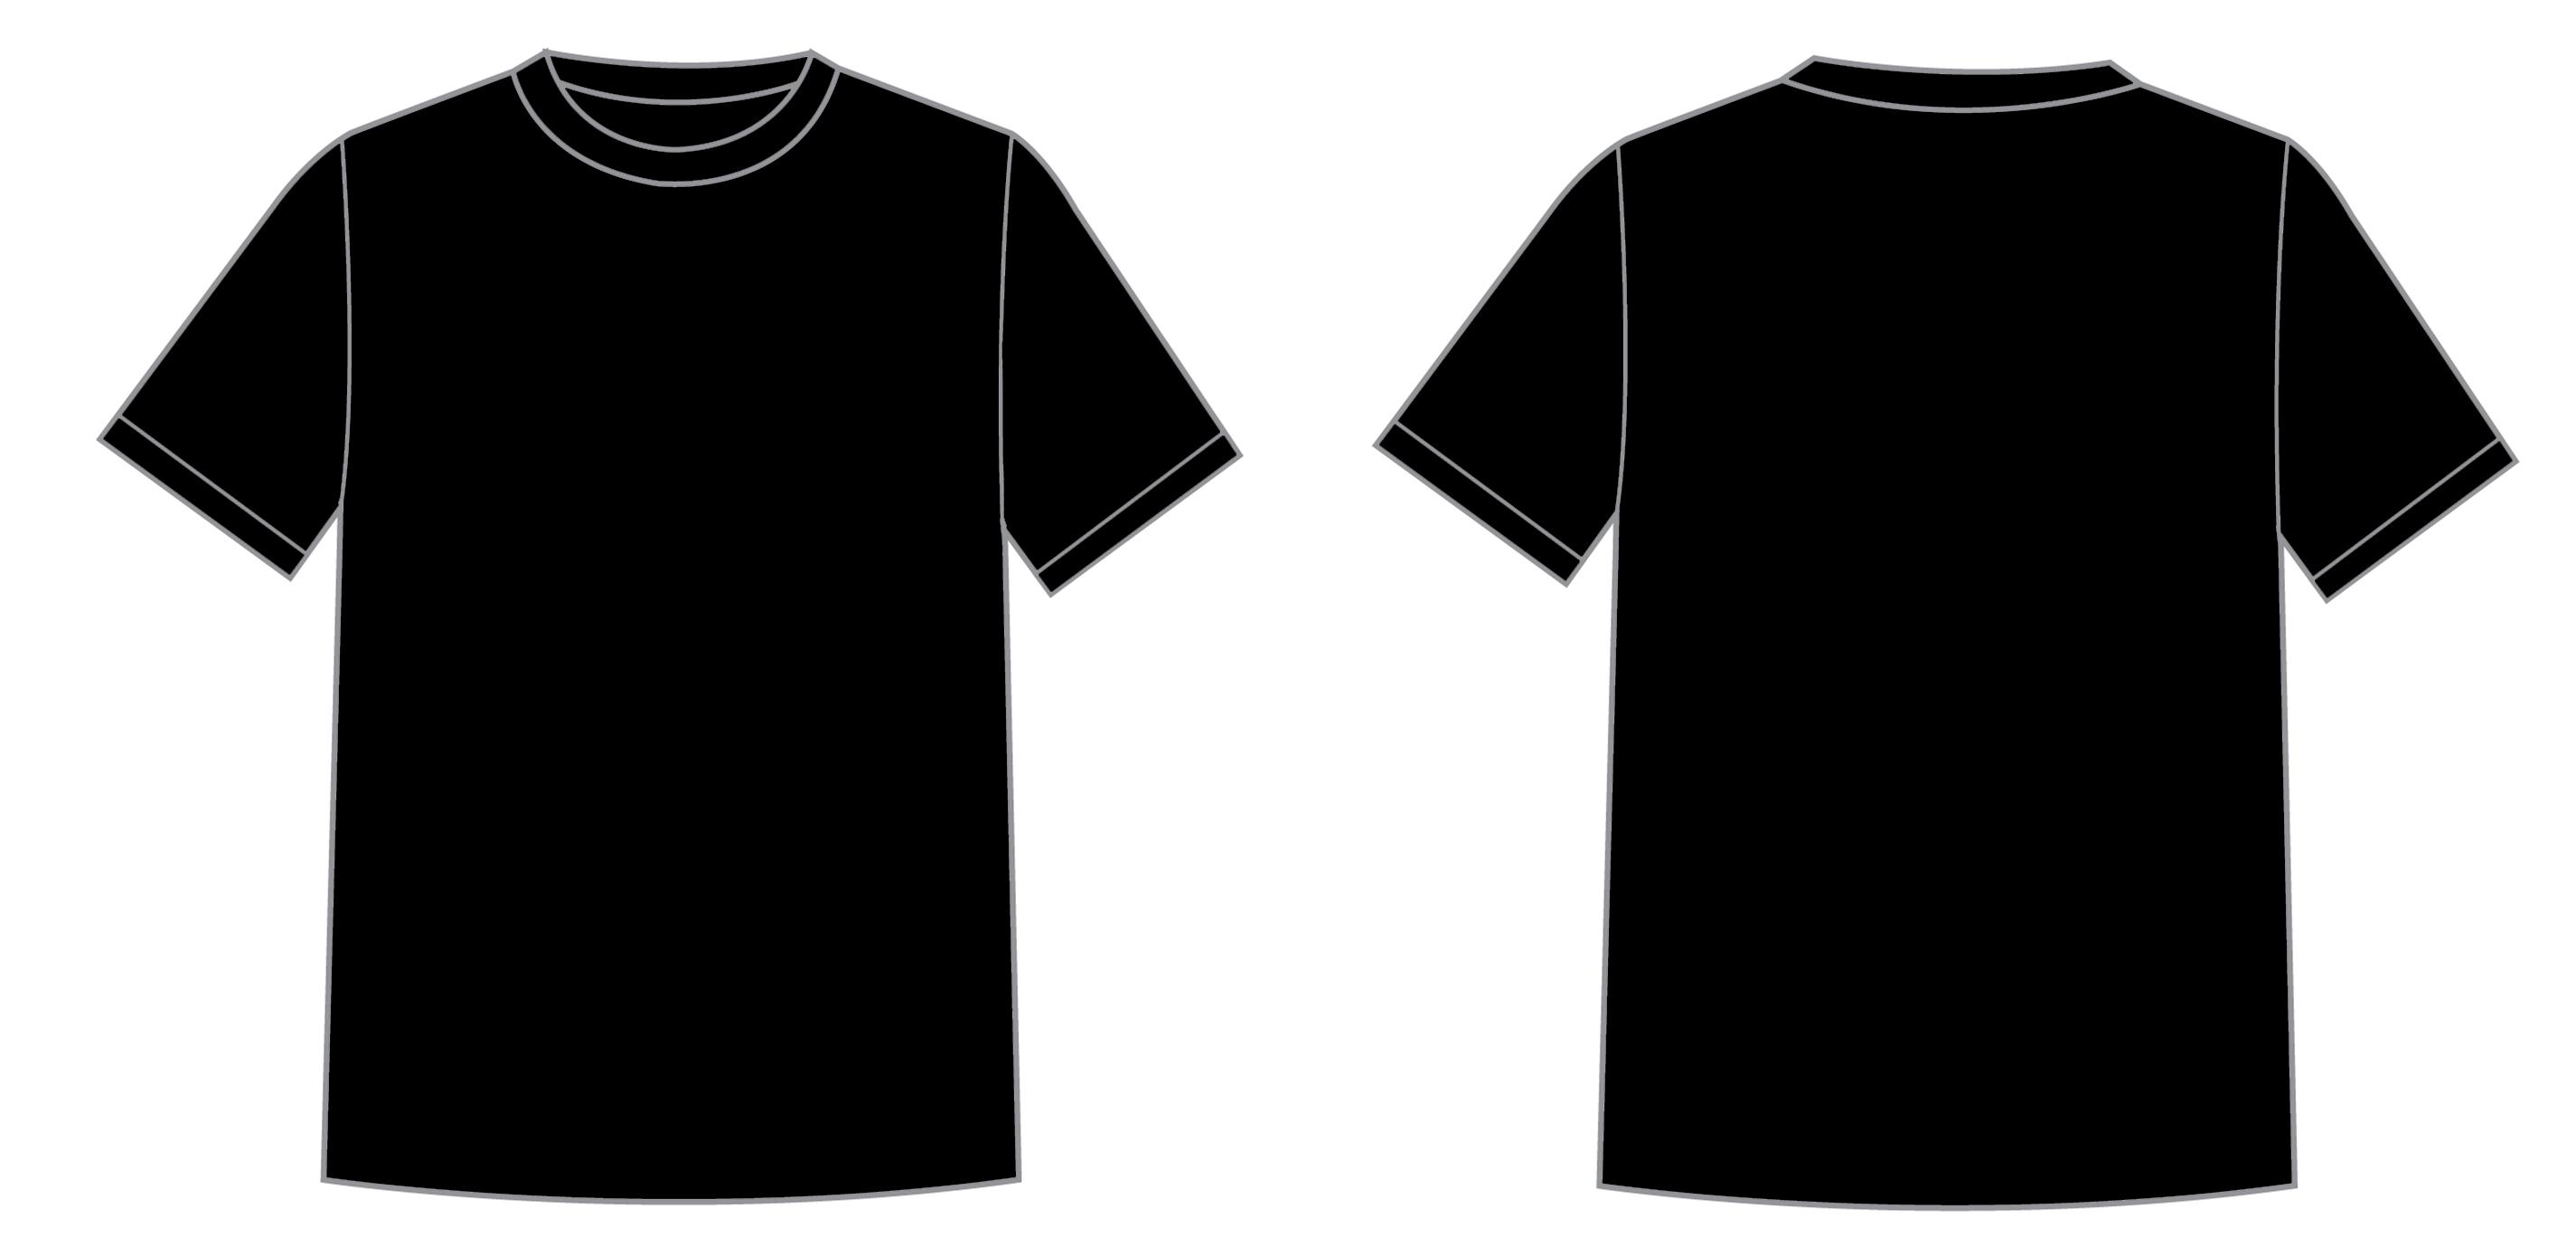 Printable T Shirt Template - ClipArt Best